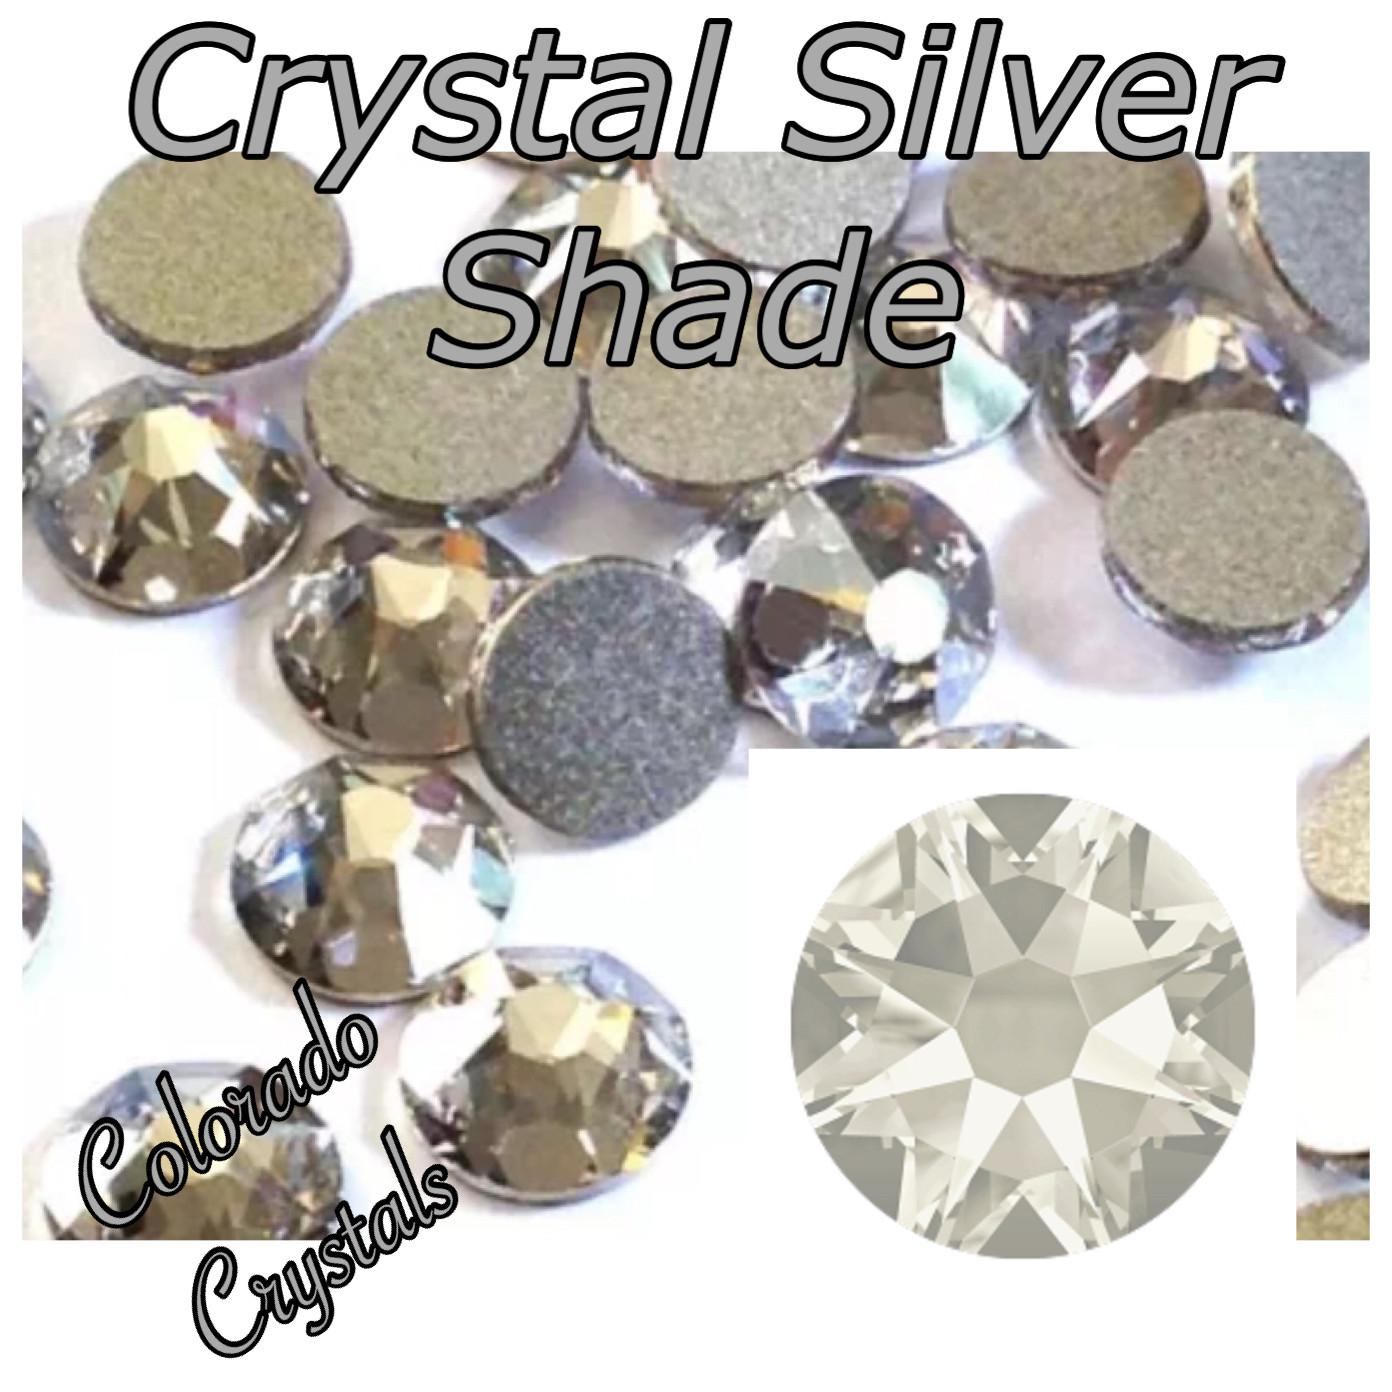 Silver Shade (Crystal) 30ss 2088 Limited Swarovski